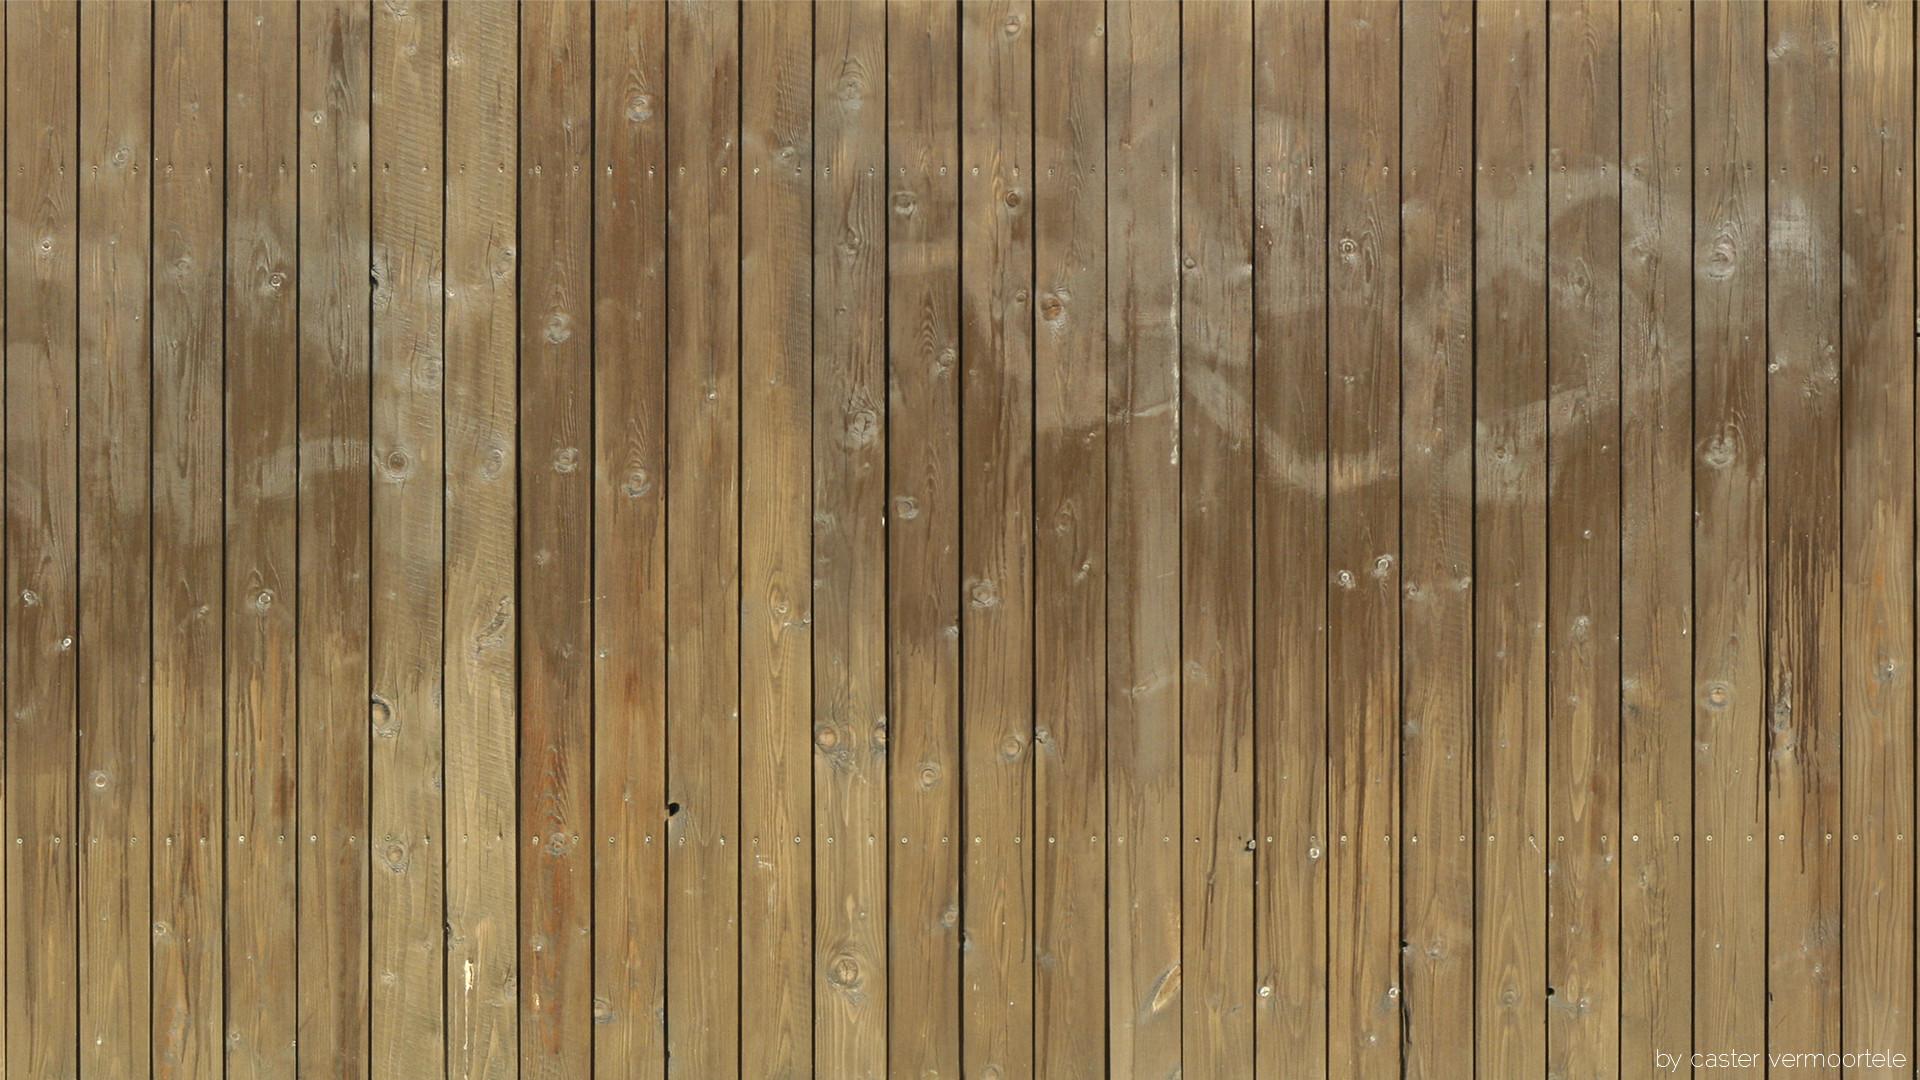 Gallery of Oak Wood Flooring Texture And Oak Wood Grain Texture Close Up  Jpg Pixels Textures